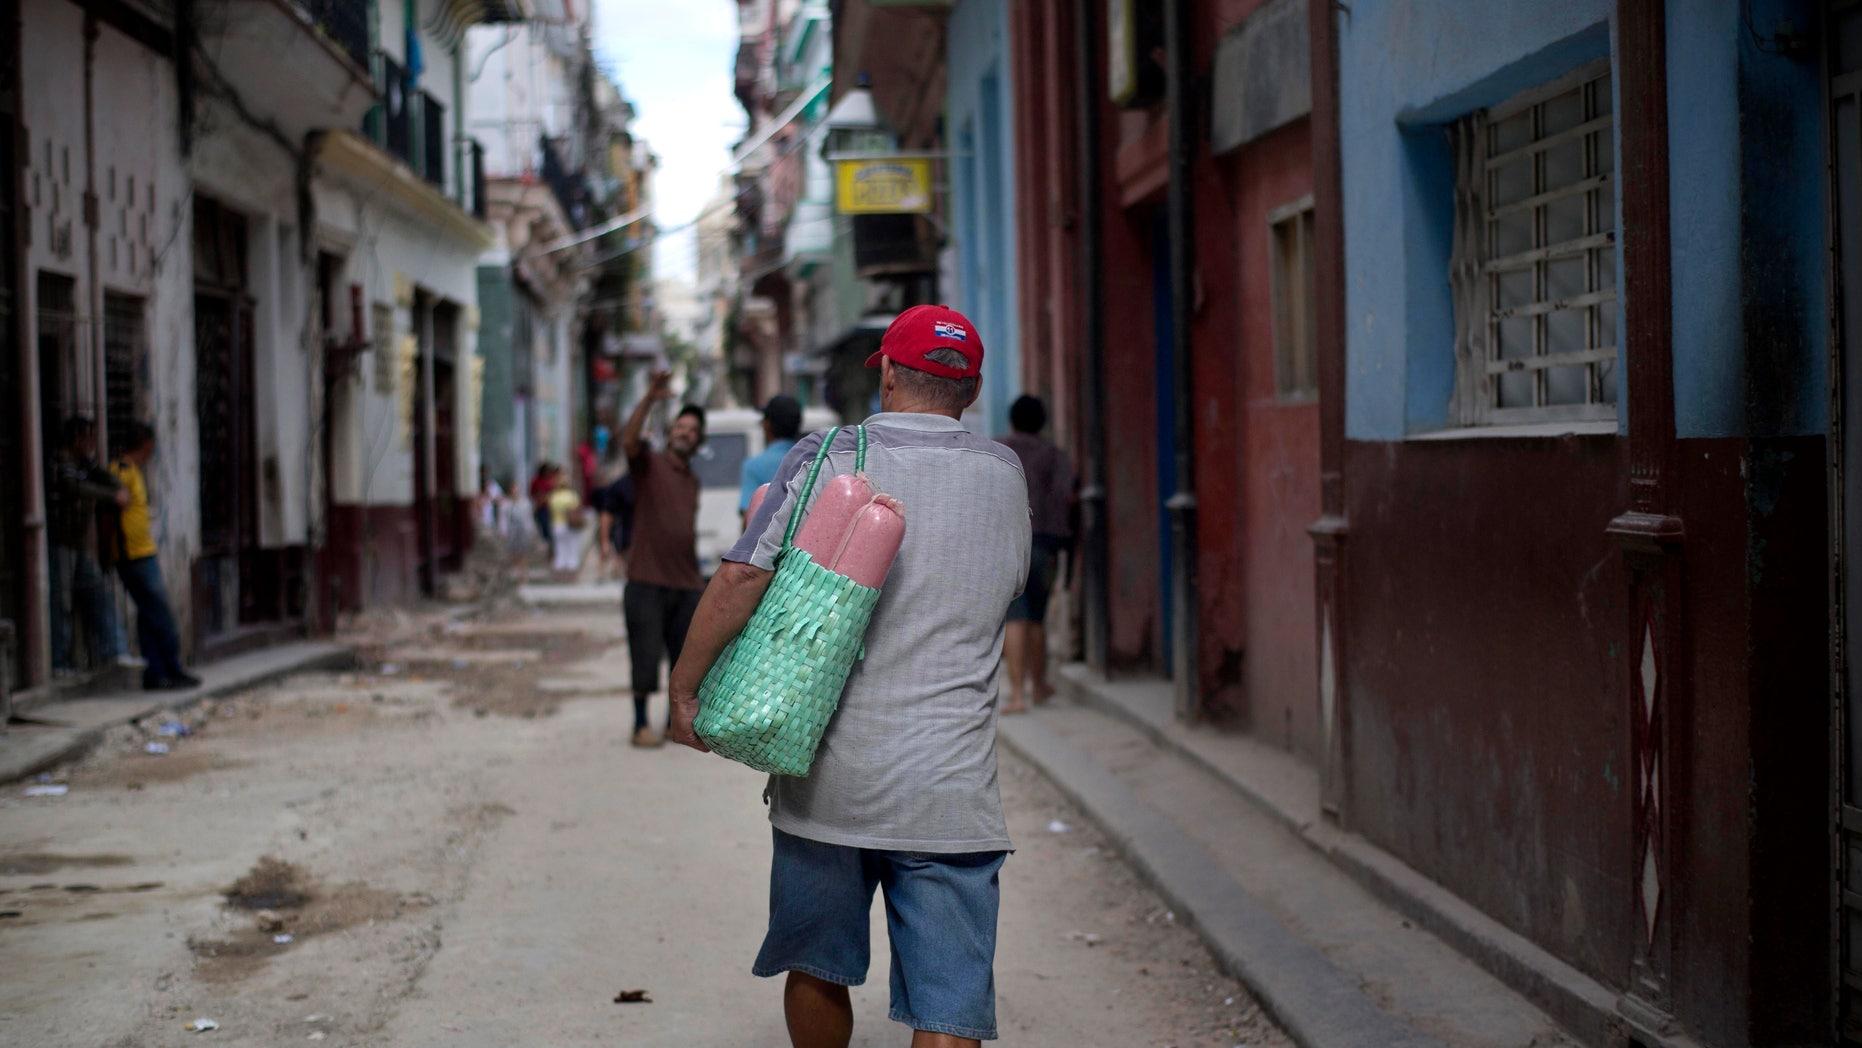 La Habana Vieja, Cuba, on Wednesday Dec. 17, 2014.